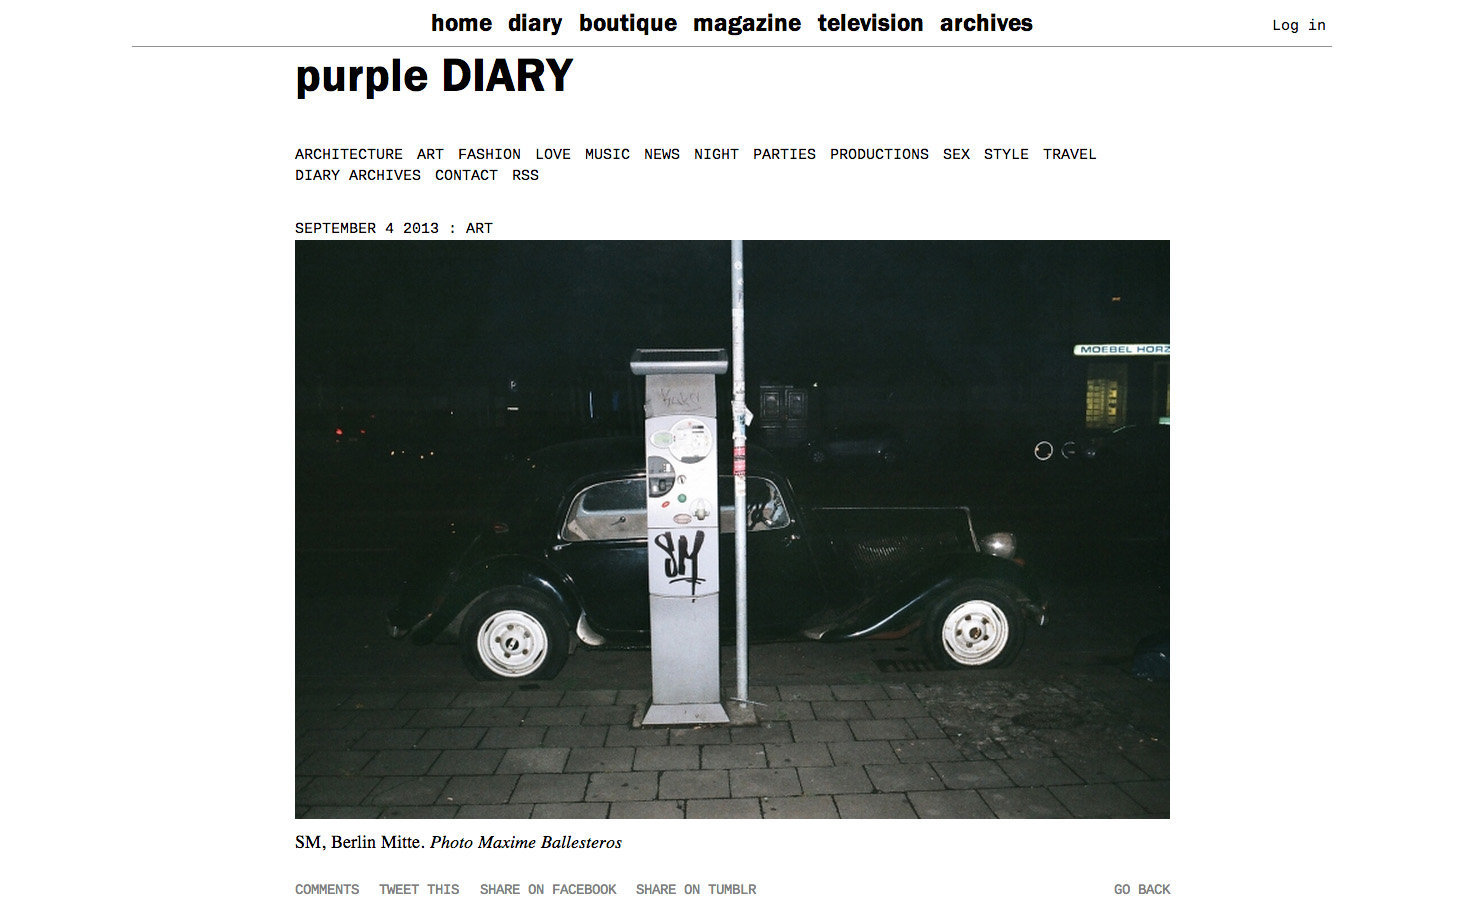 purple DIARY   SM  Berlin Mitte. Photo Maxime.jpg